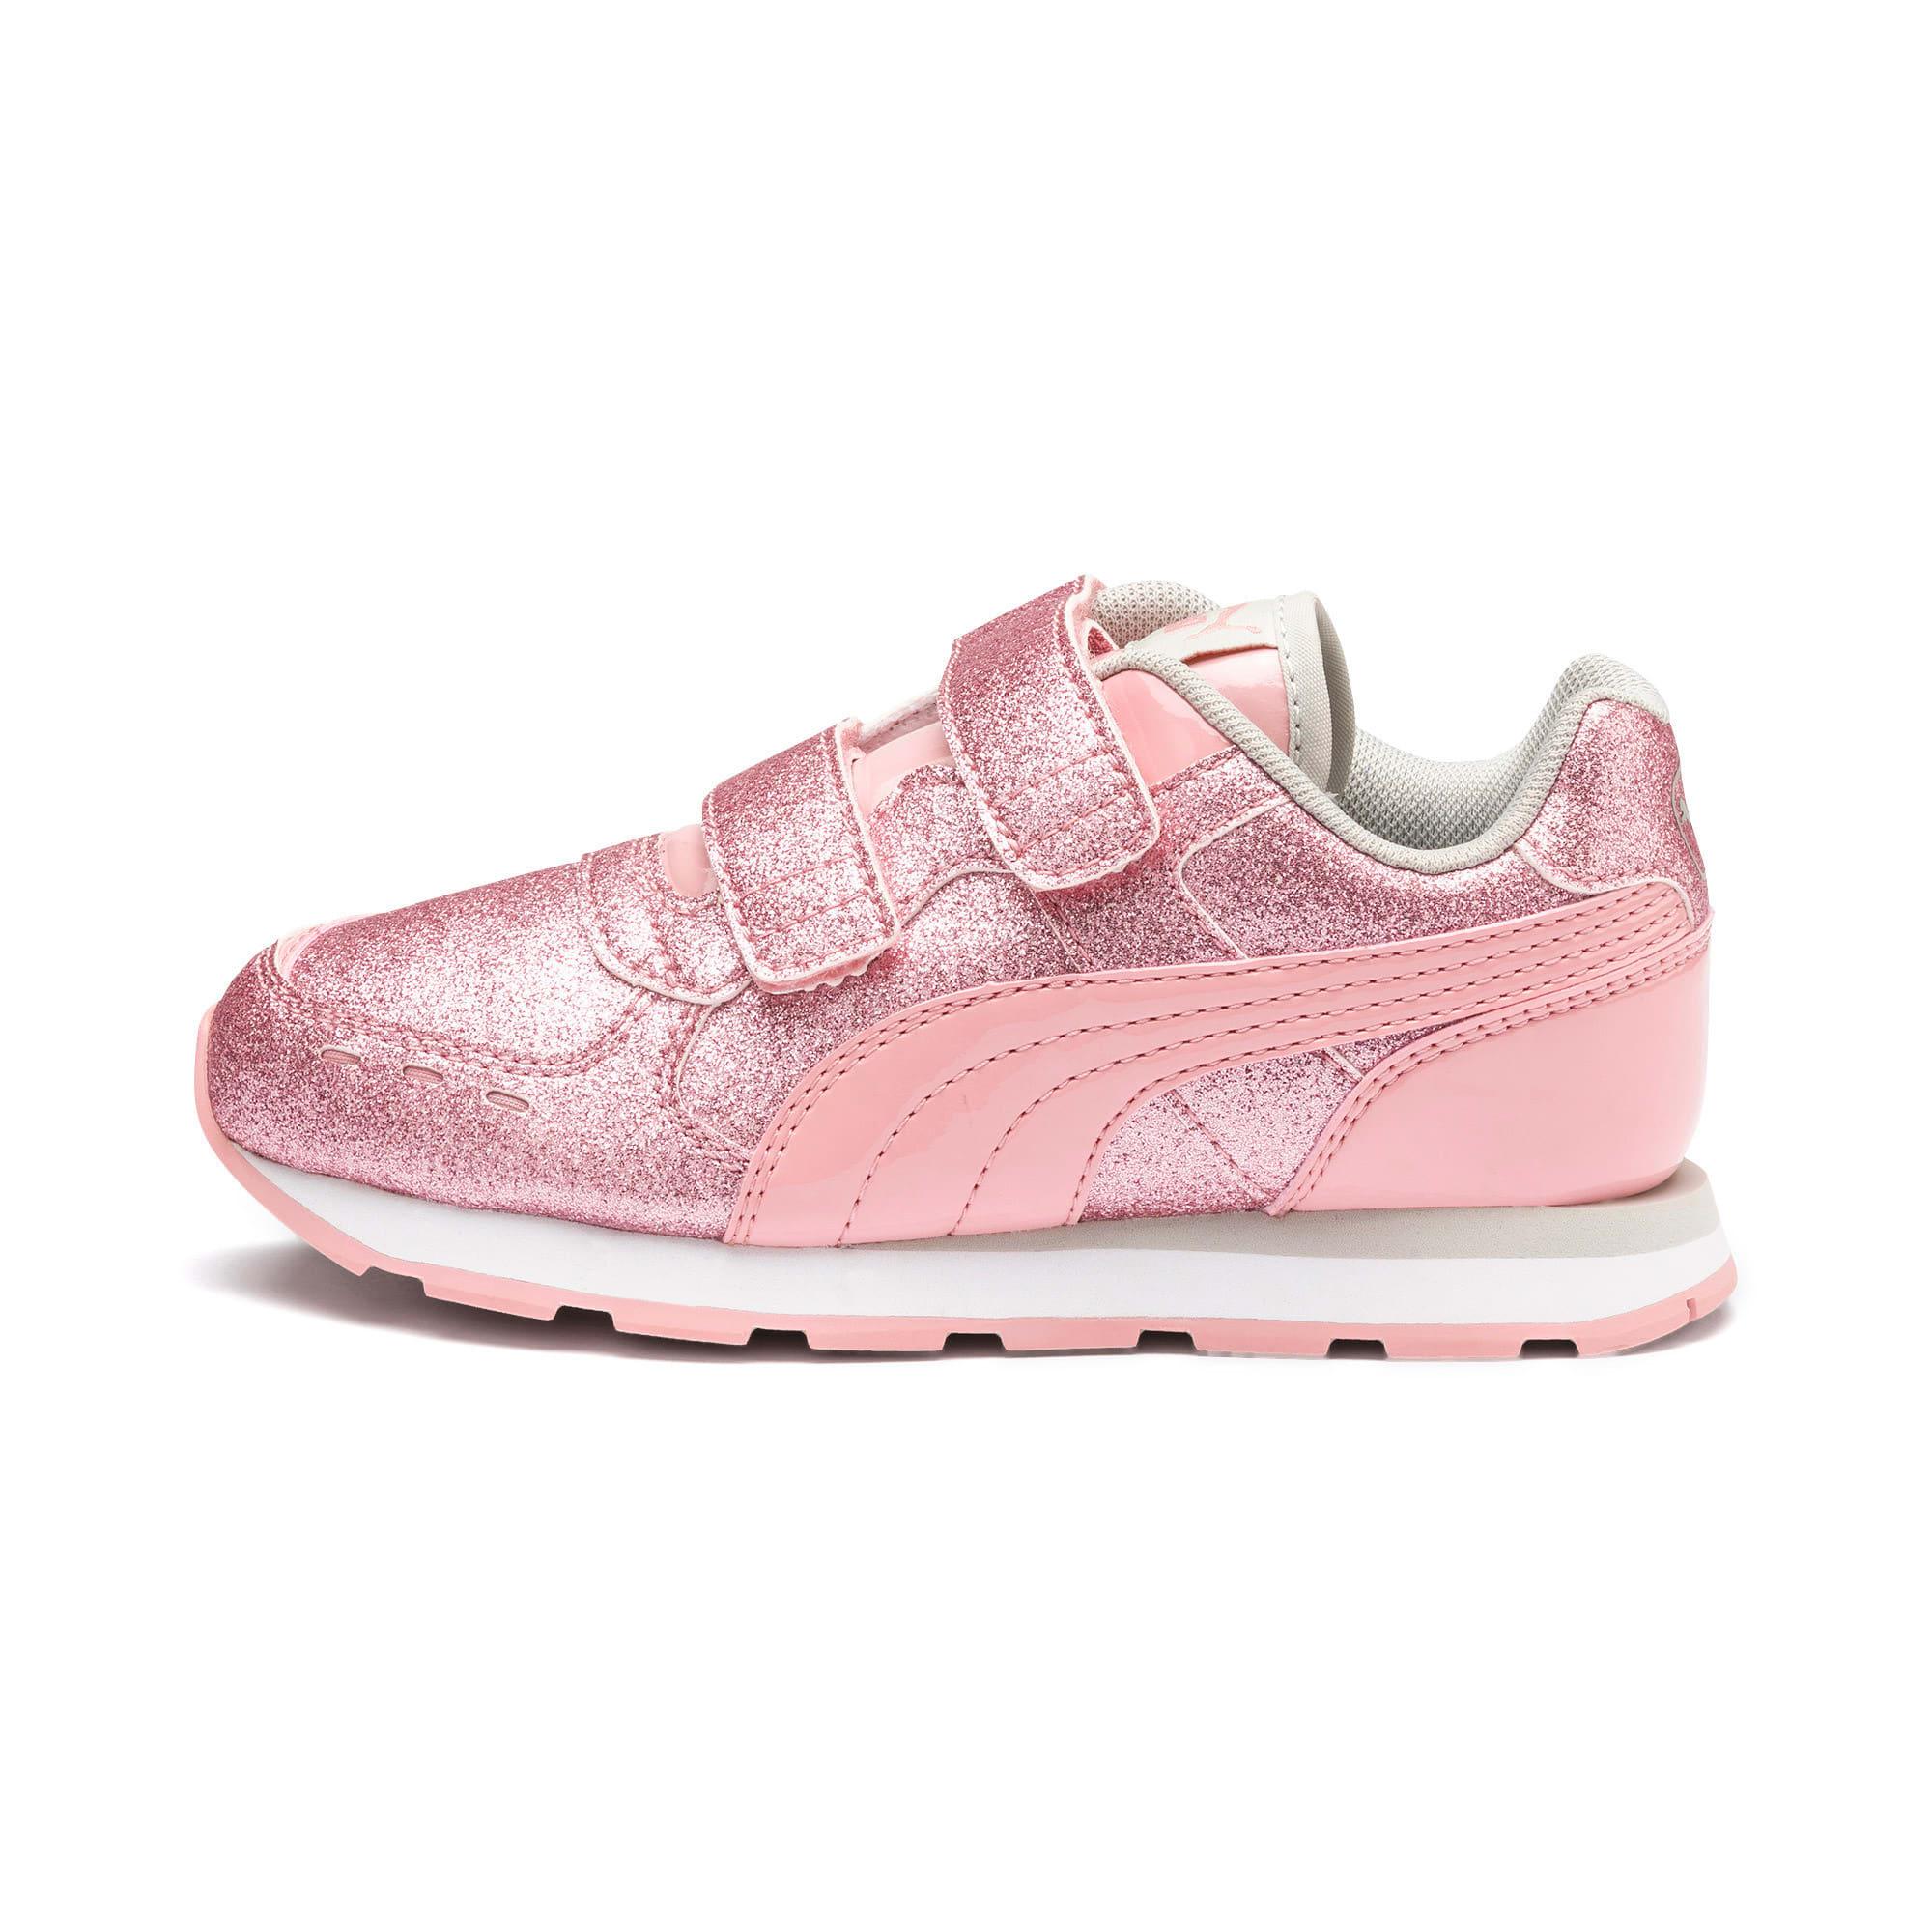 Miniatura 1 de Zapatos Vista Glitz para niña pequeña, Bridal Rose-Gray Violet, mediano